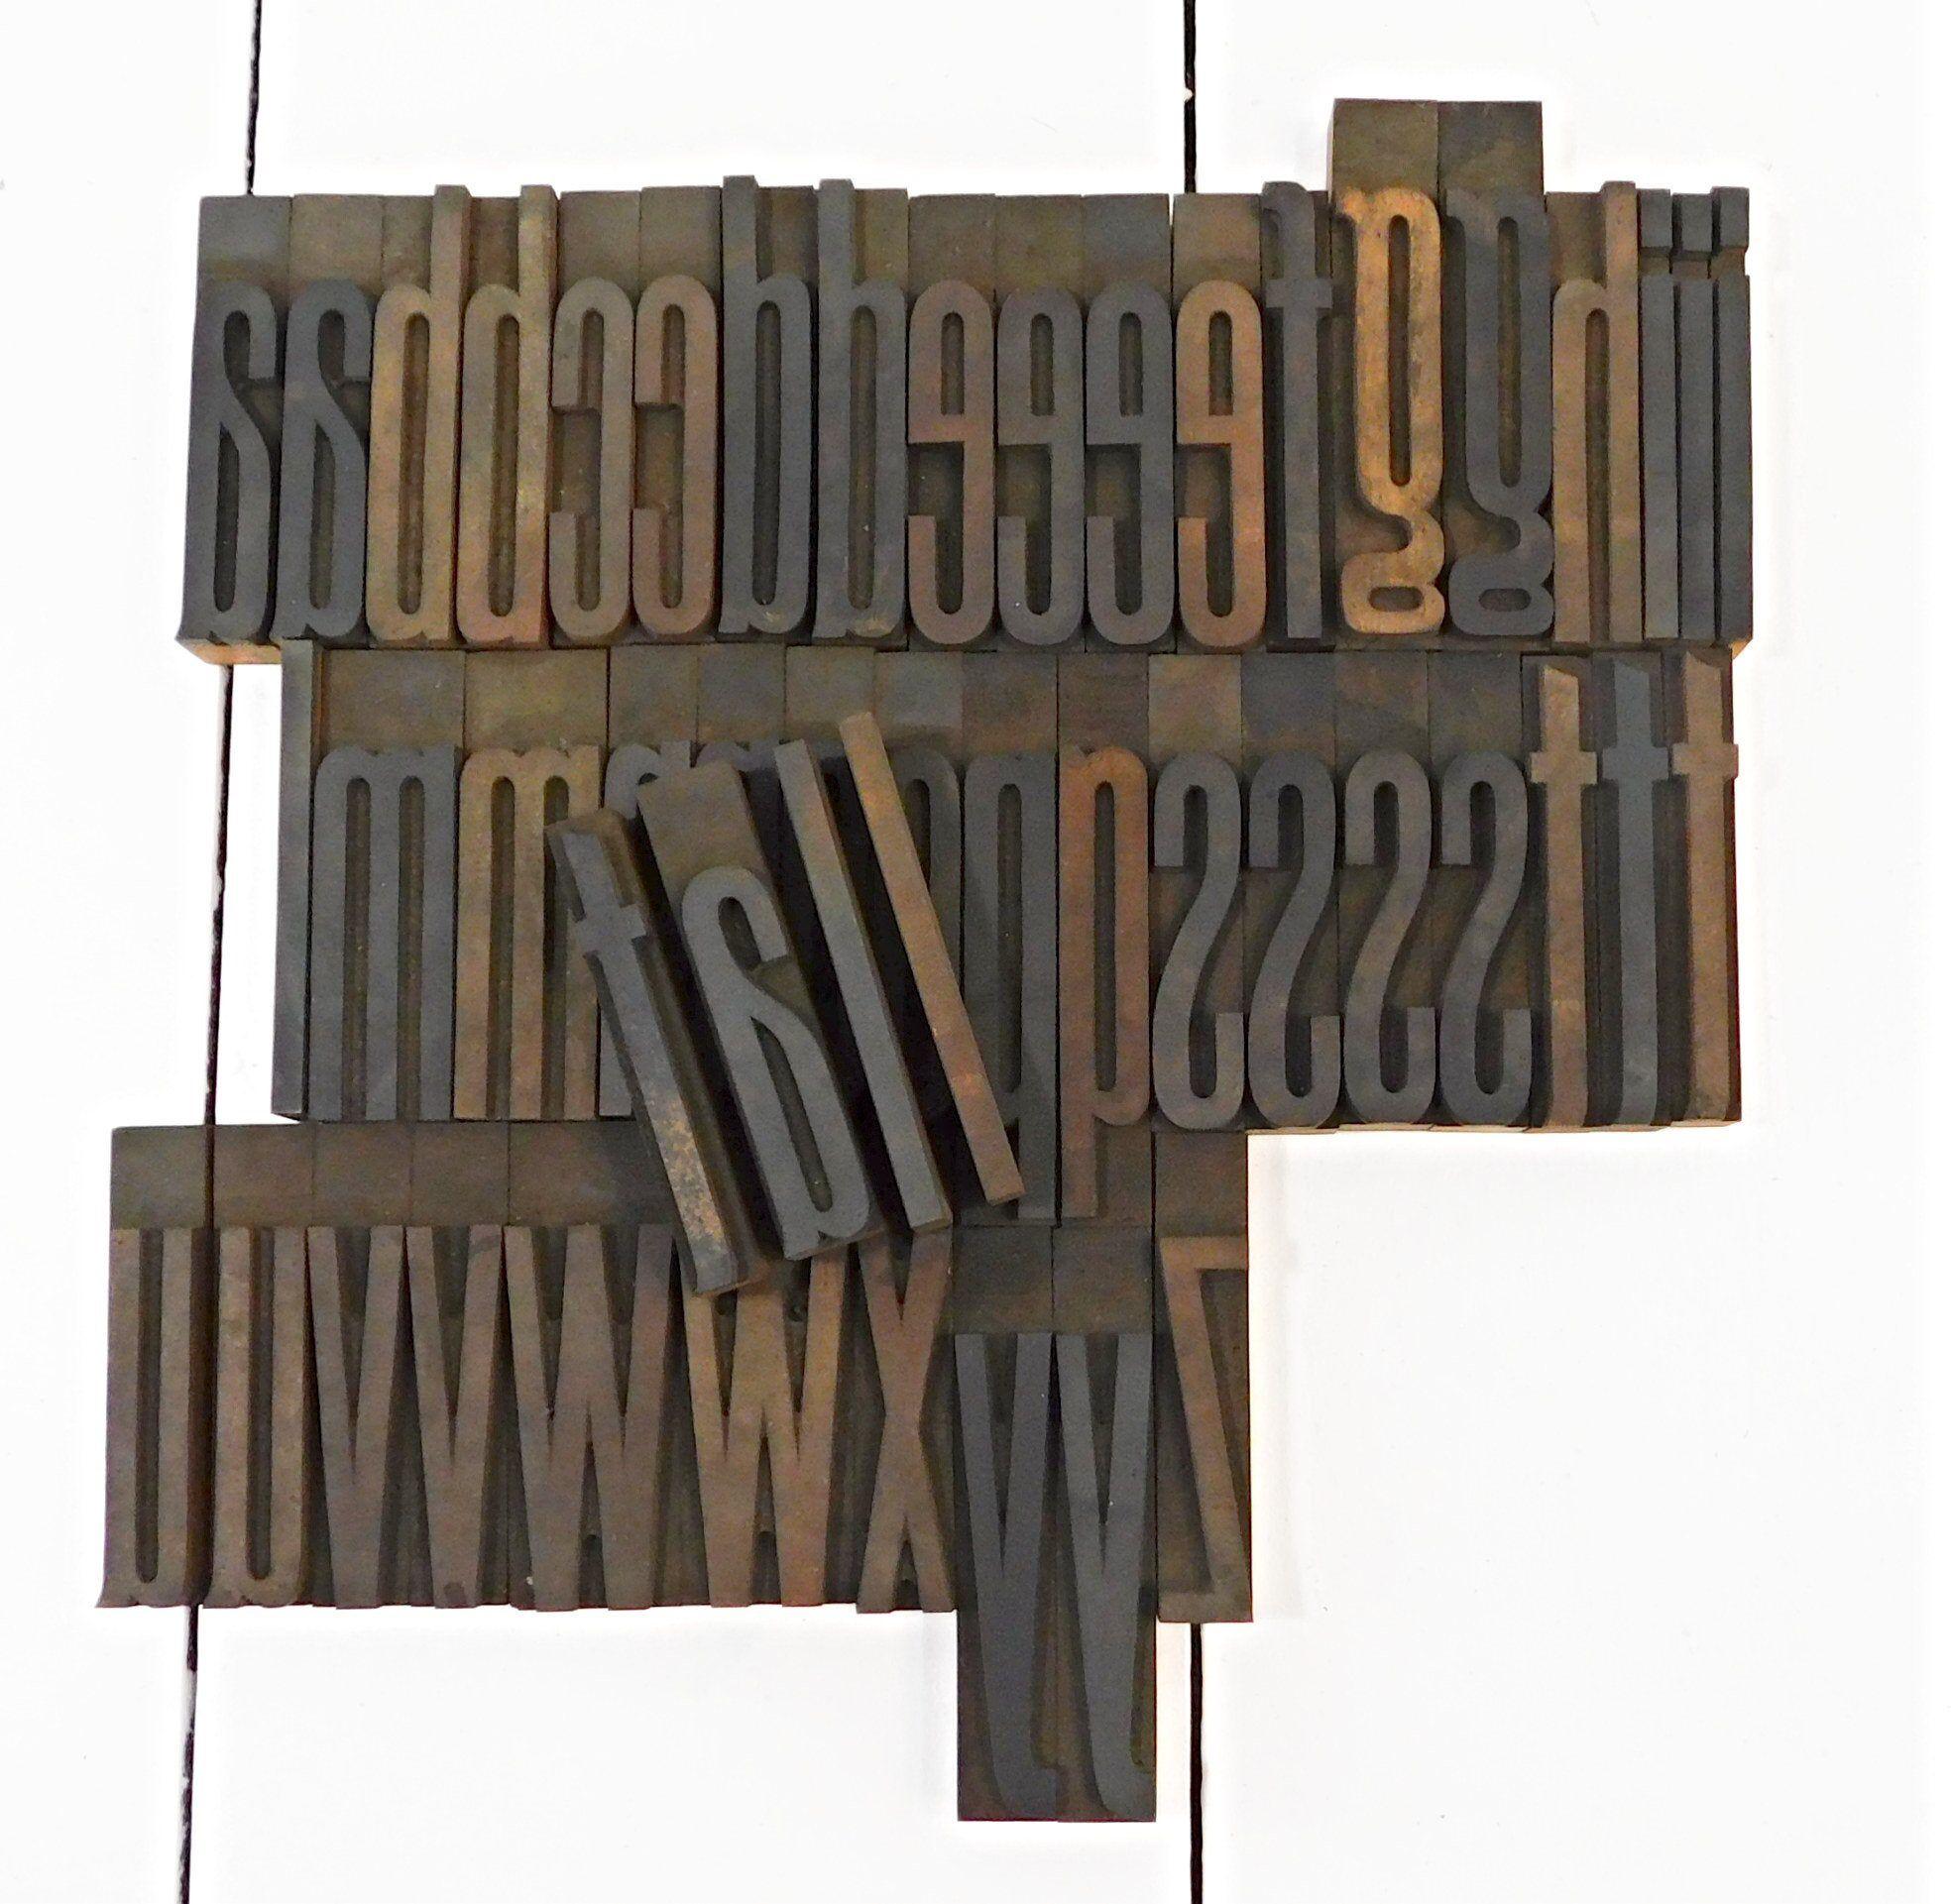 choose letters Vintage letterpress wooden printing blocks sold individually